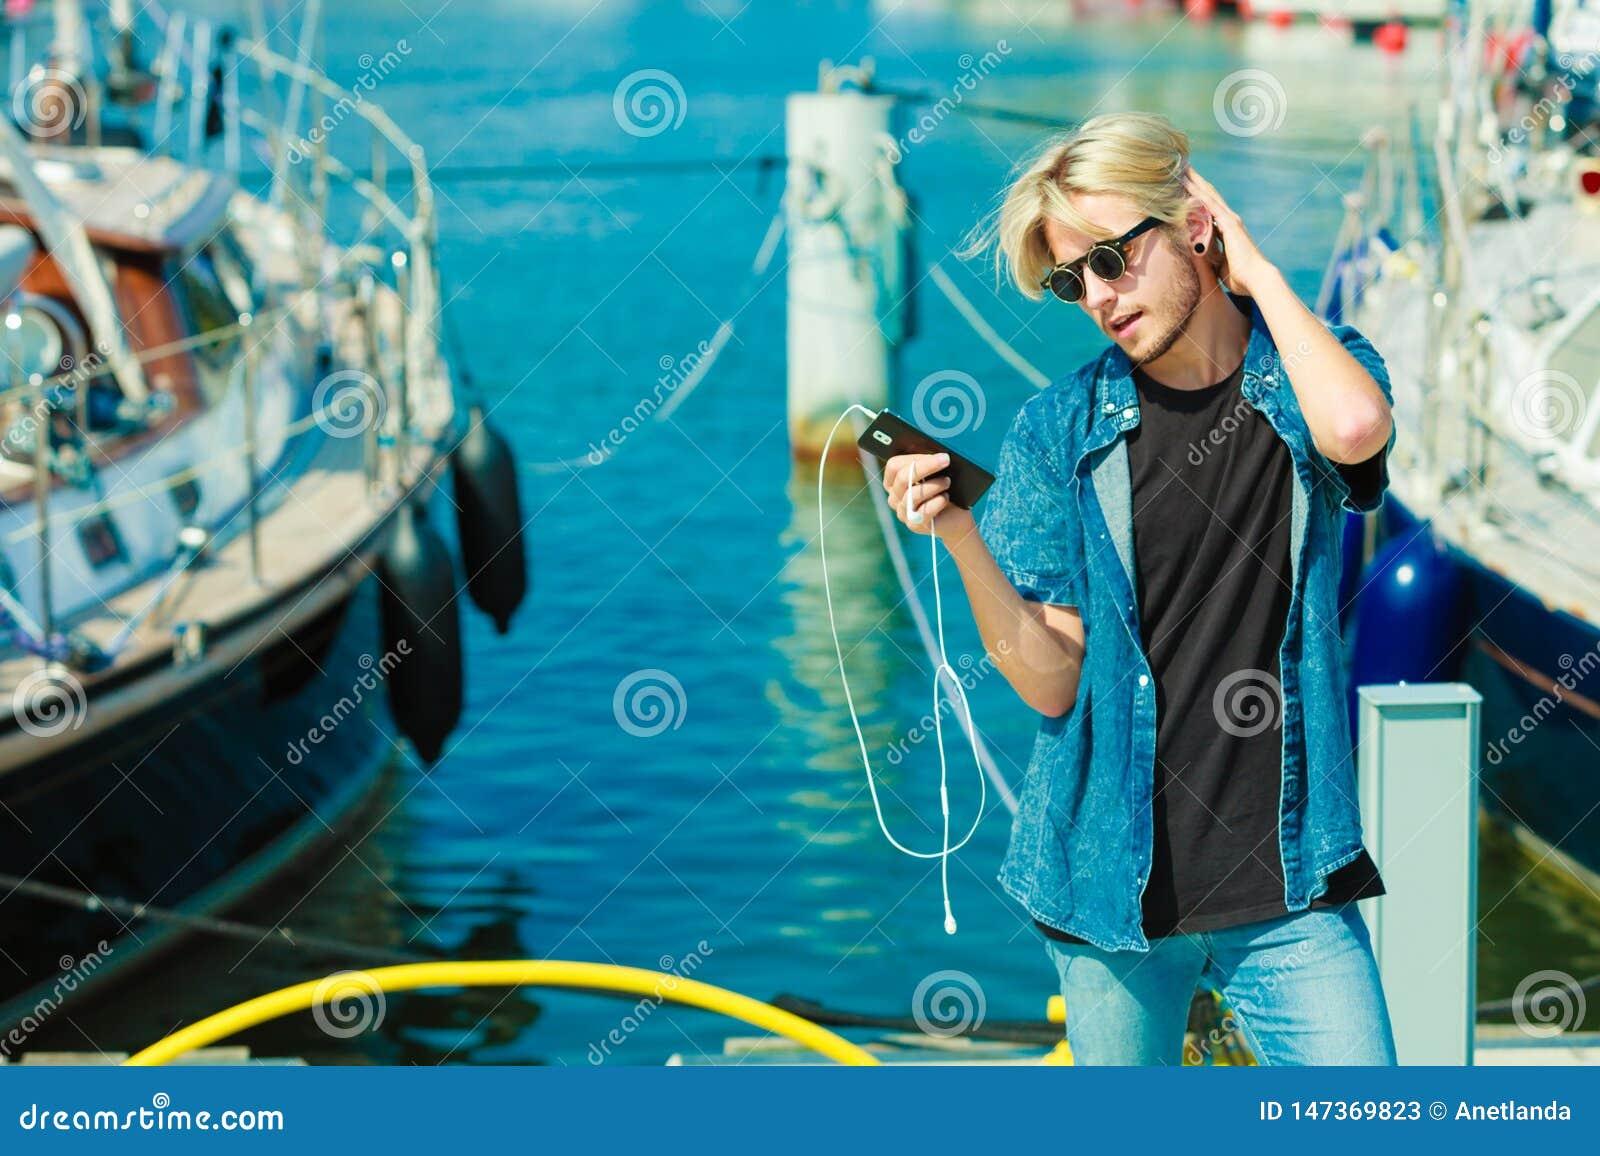 Homme blond dehors utilisant son smartphone